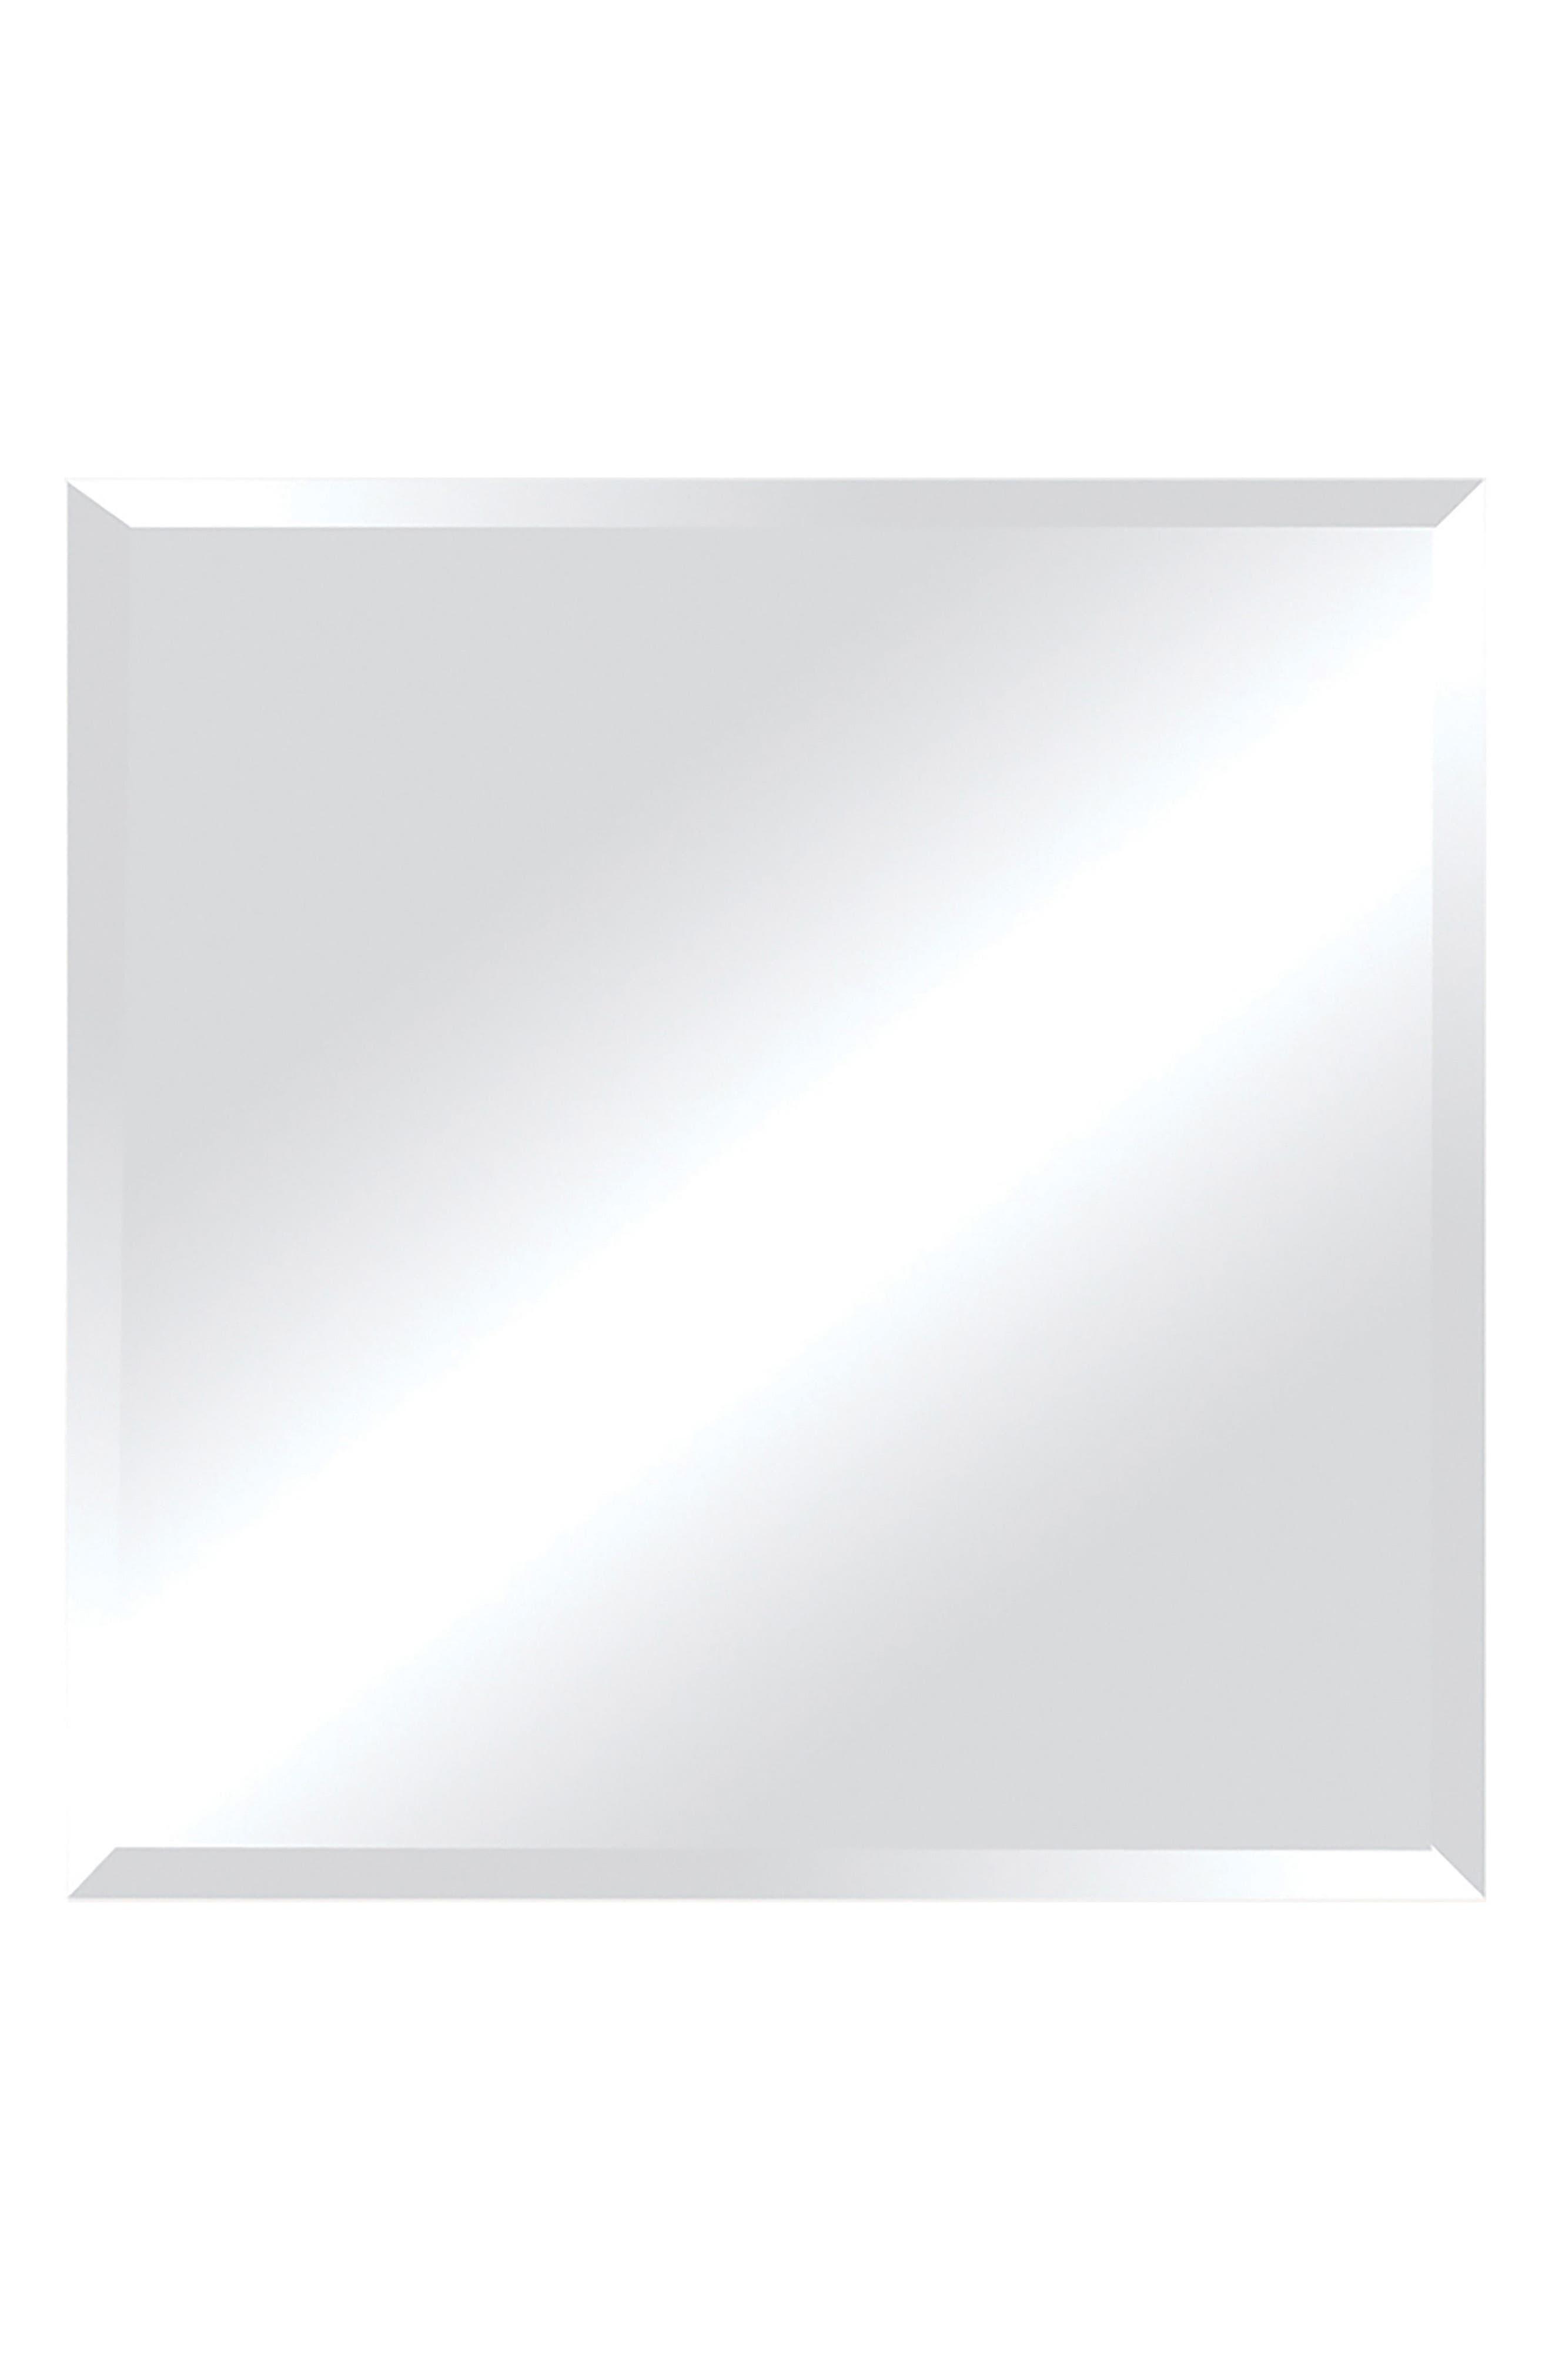 Main Image - Renwil Vogue Mirror